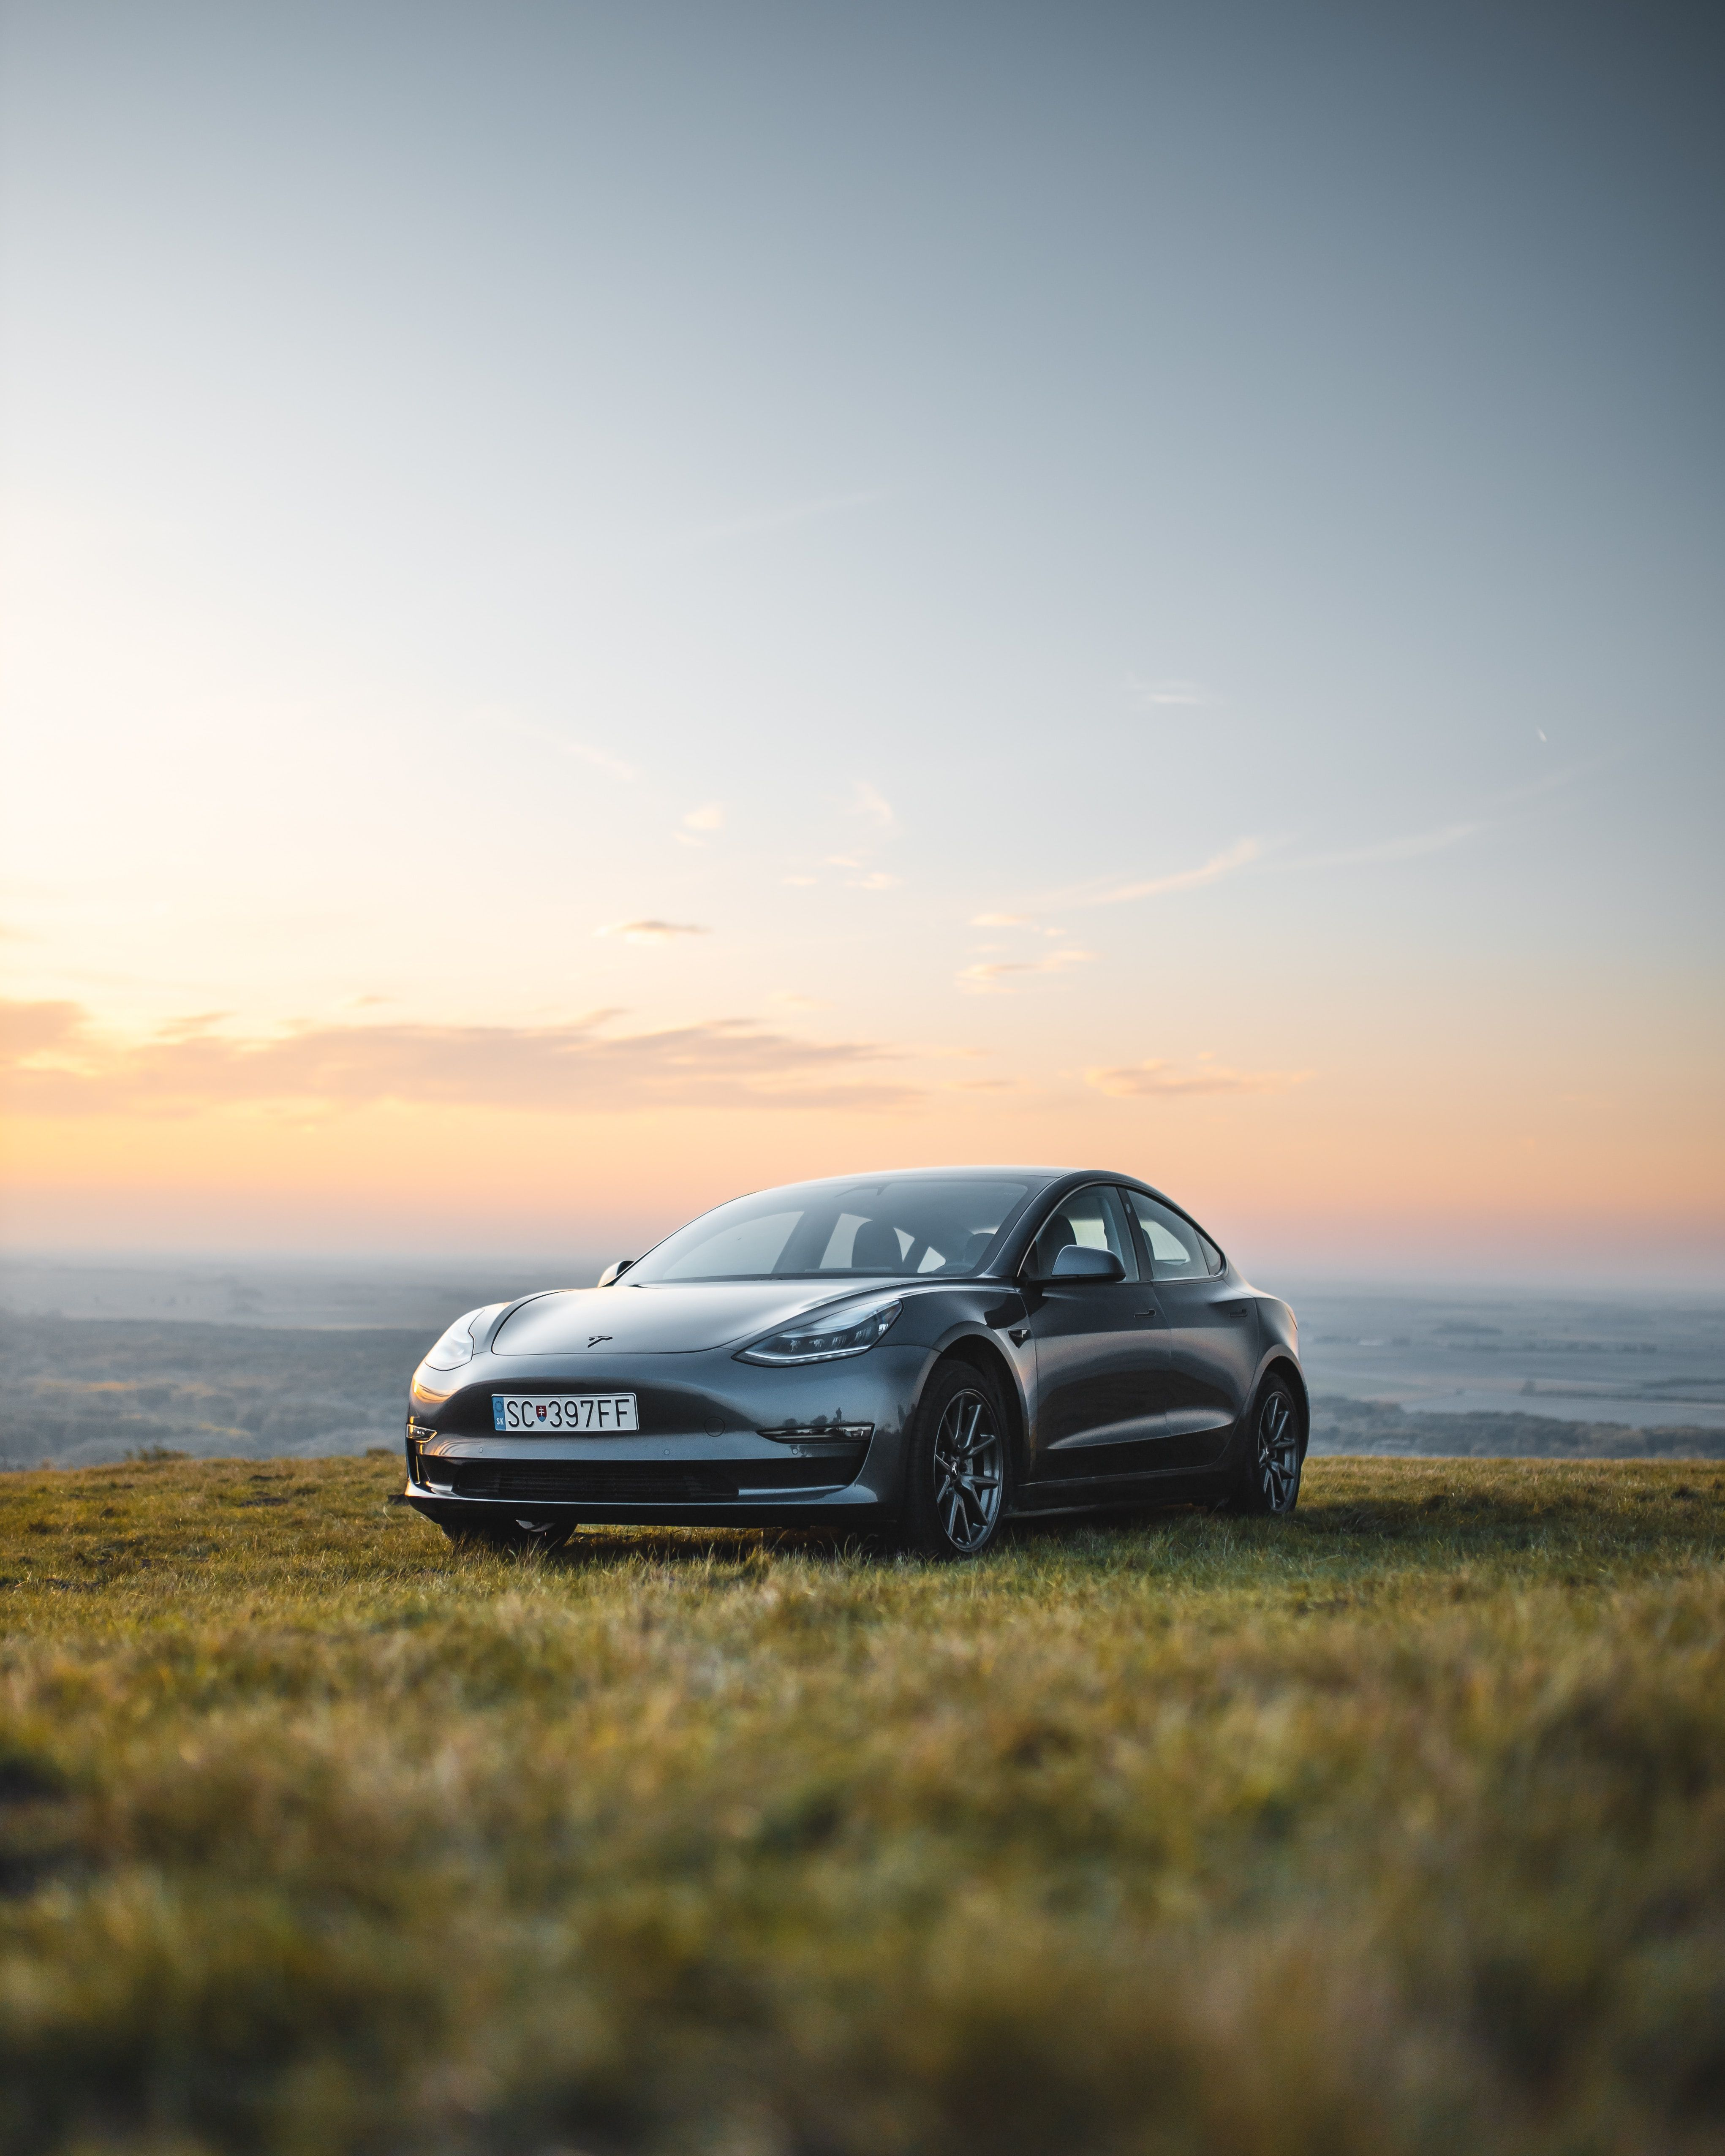 Cars Without Gas Tesla Model 3 Tesla Model Picsart Editing Background